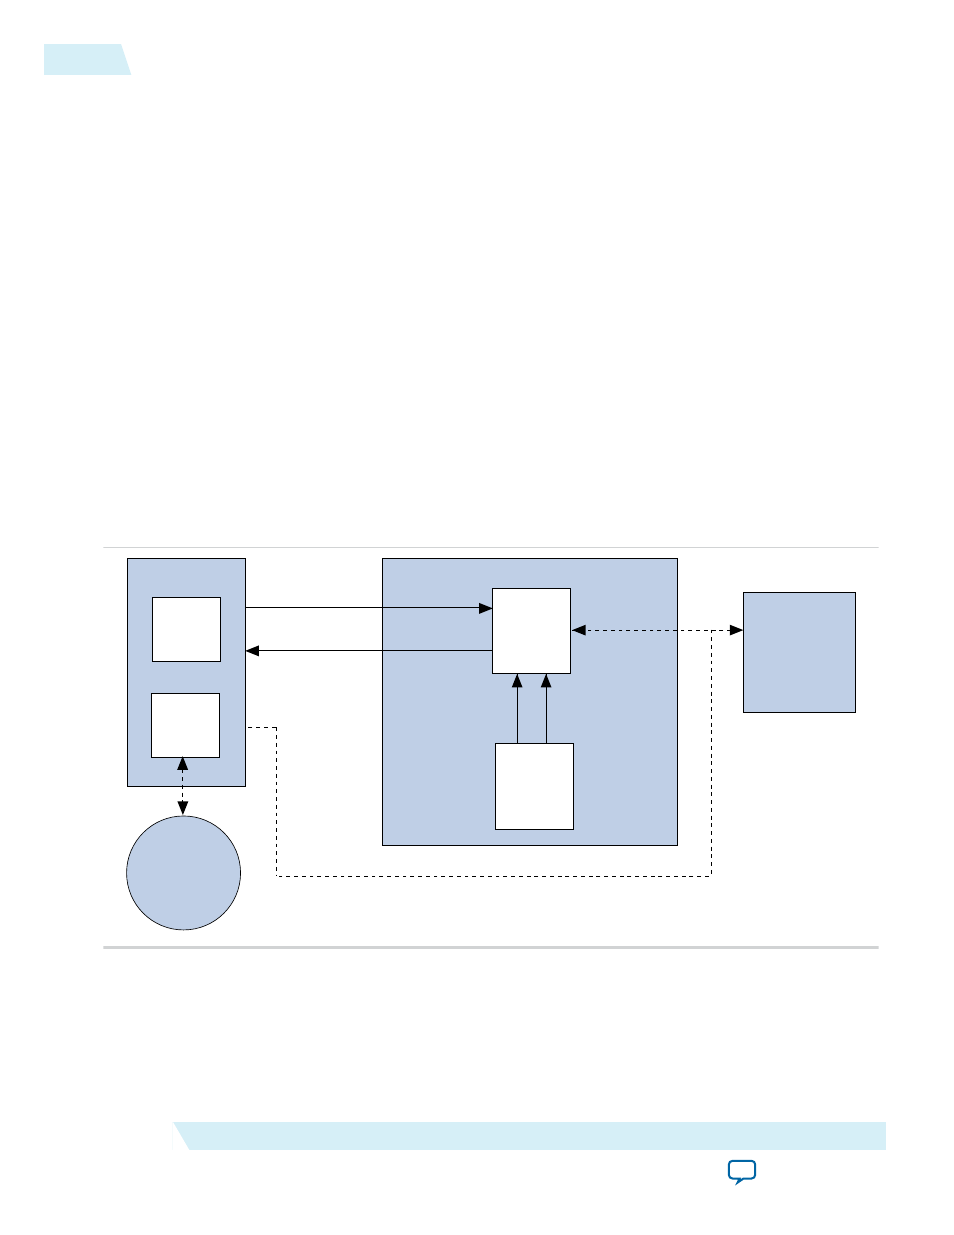 User Watchdog Timer Altera Parallel Flash Loader Ip Manual Background Image